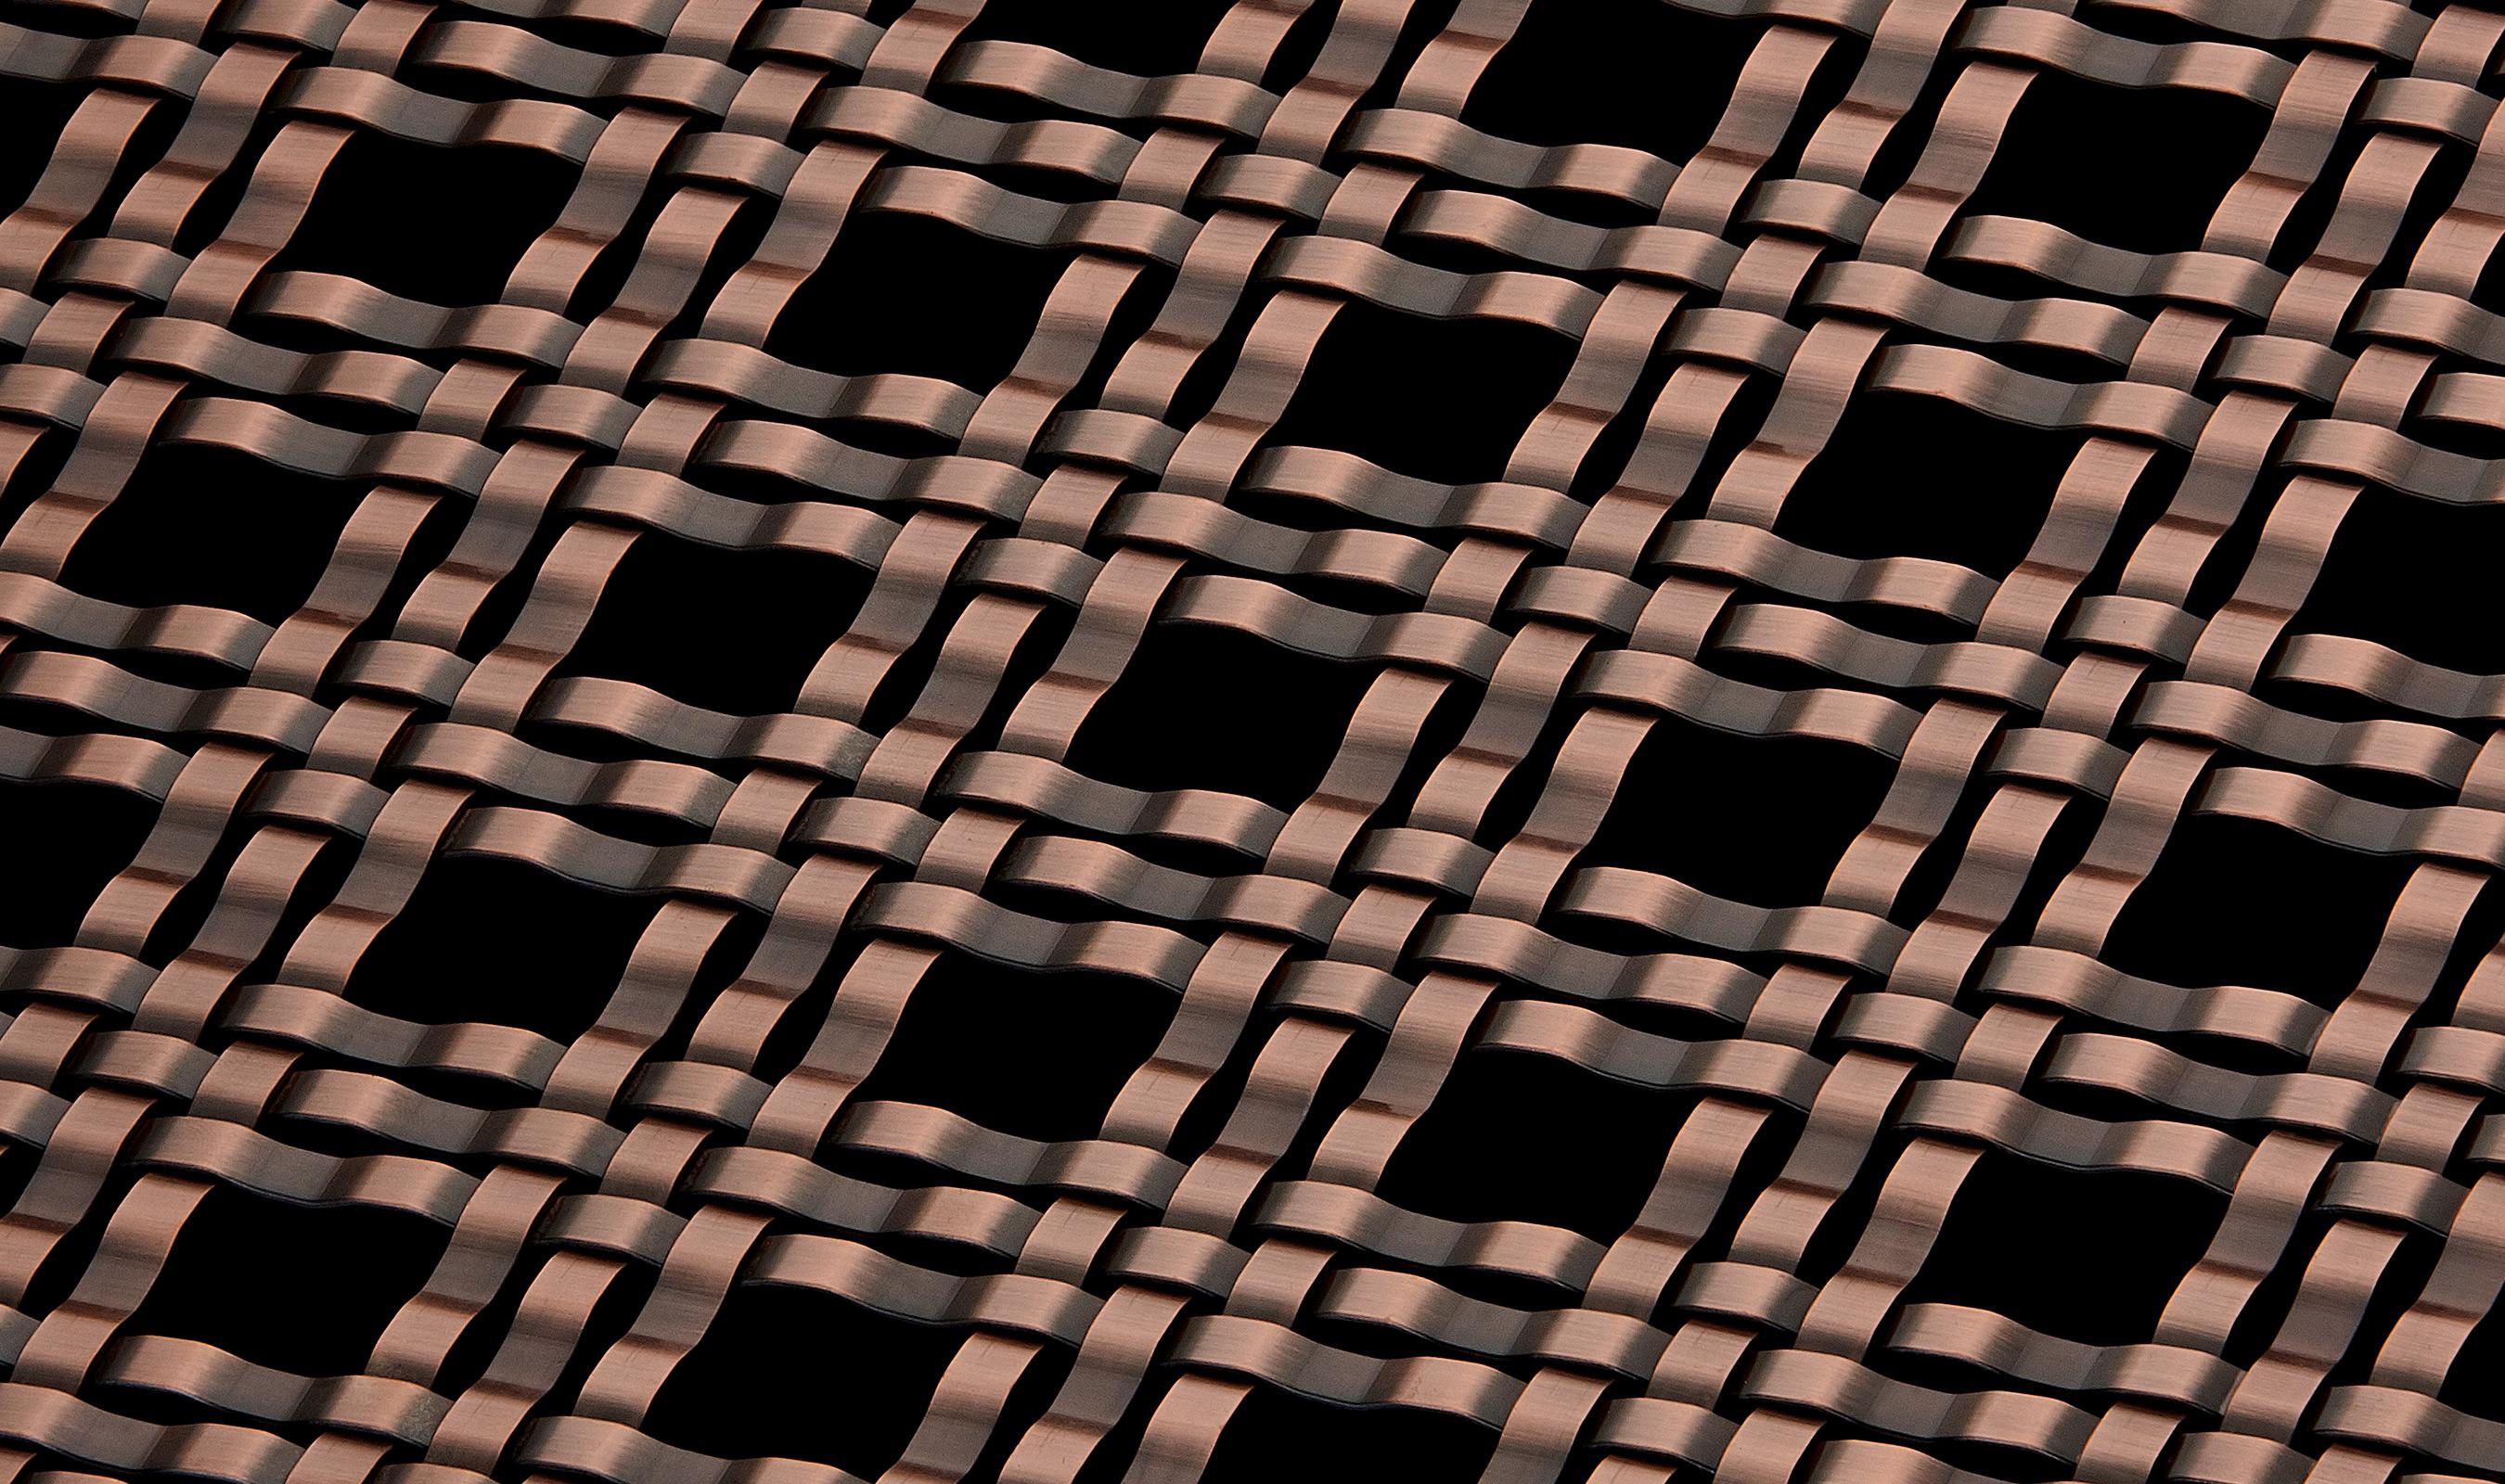 M33-5 Antique Copper Plated decorative wire mesh pattern